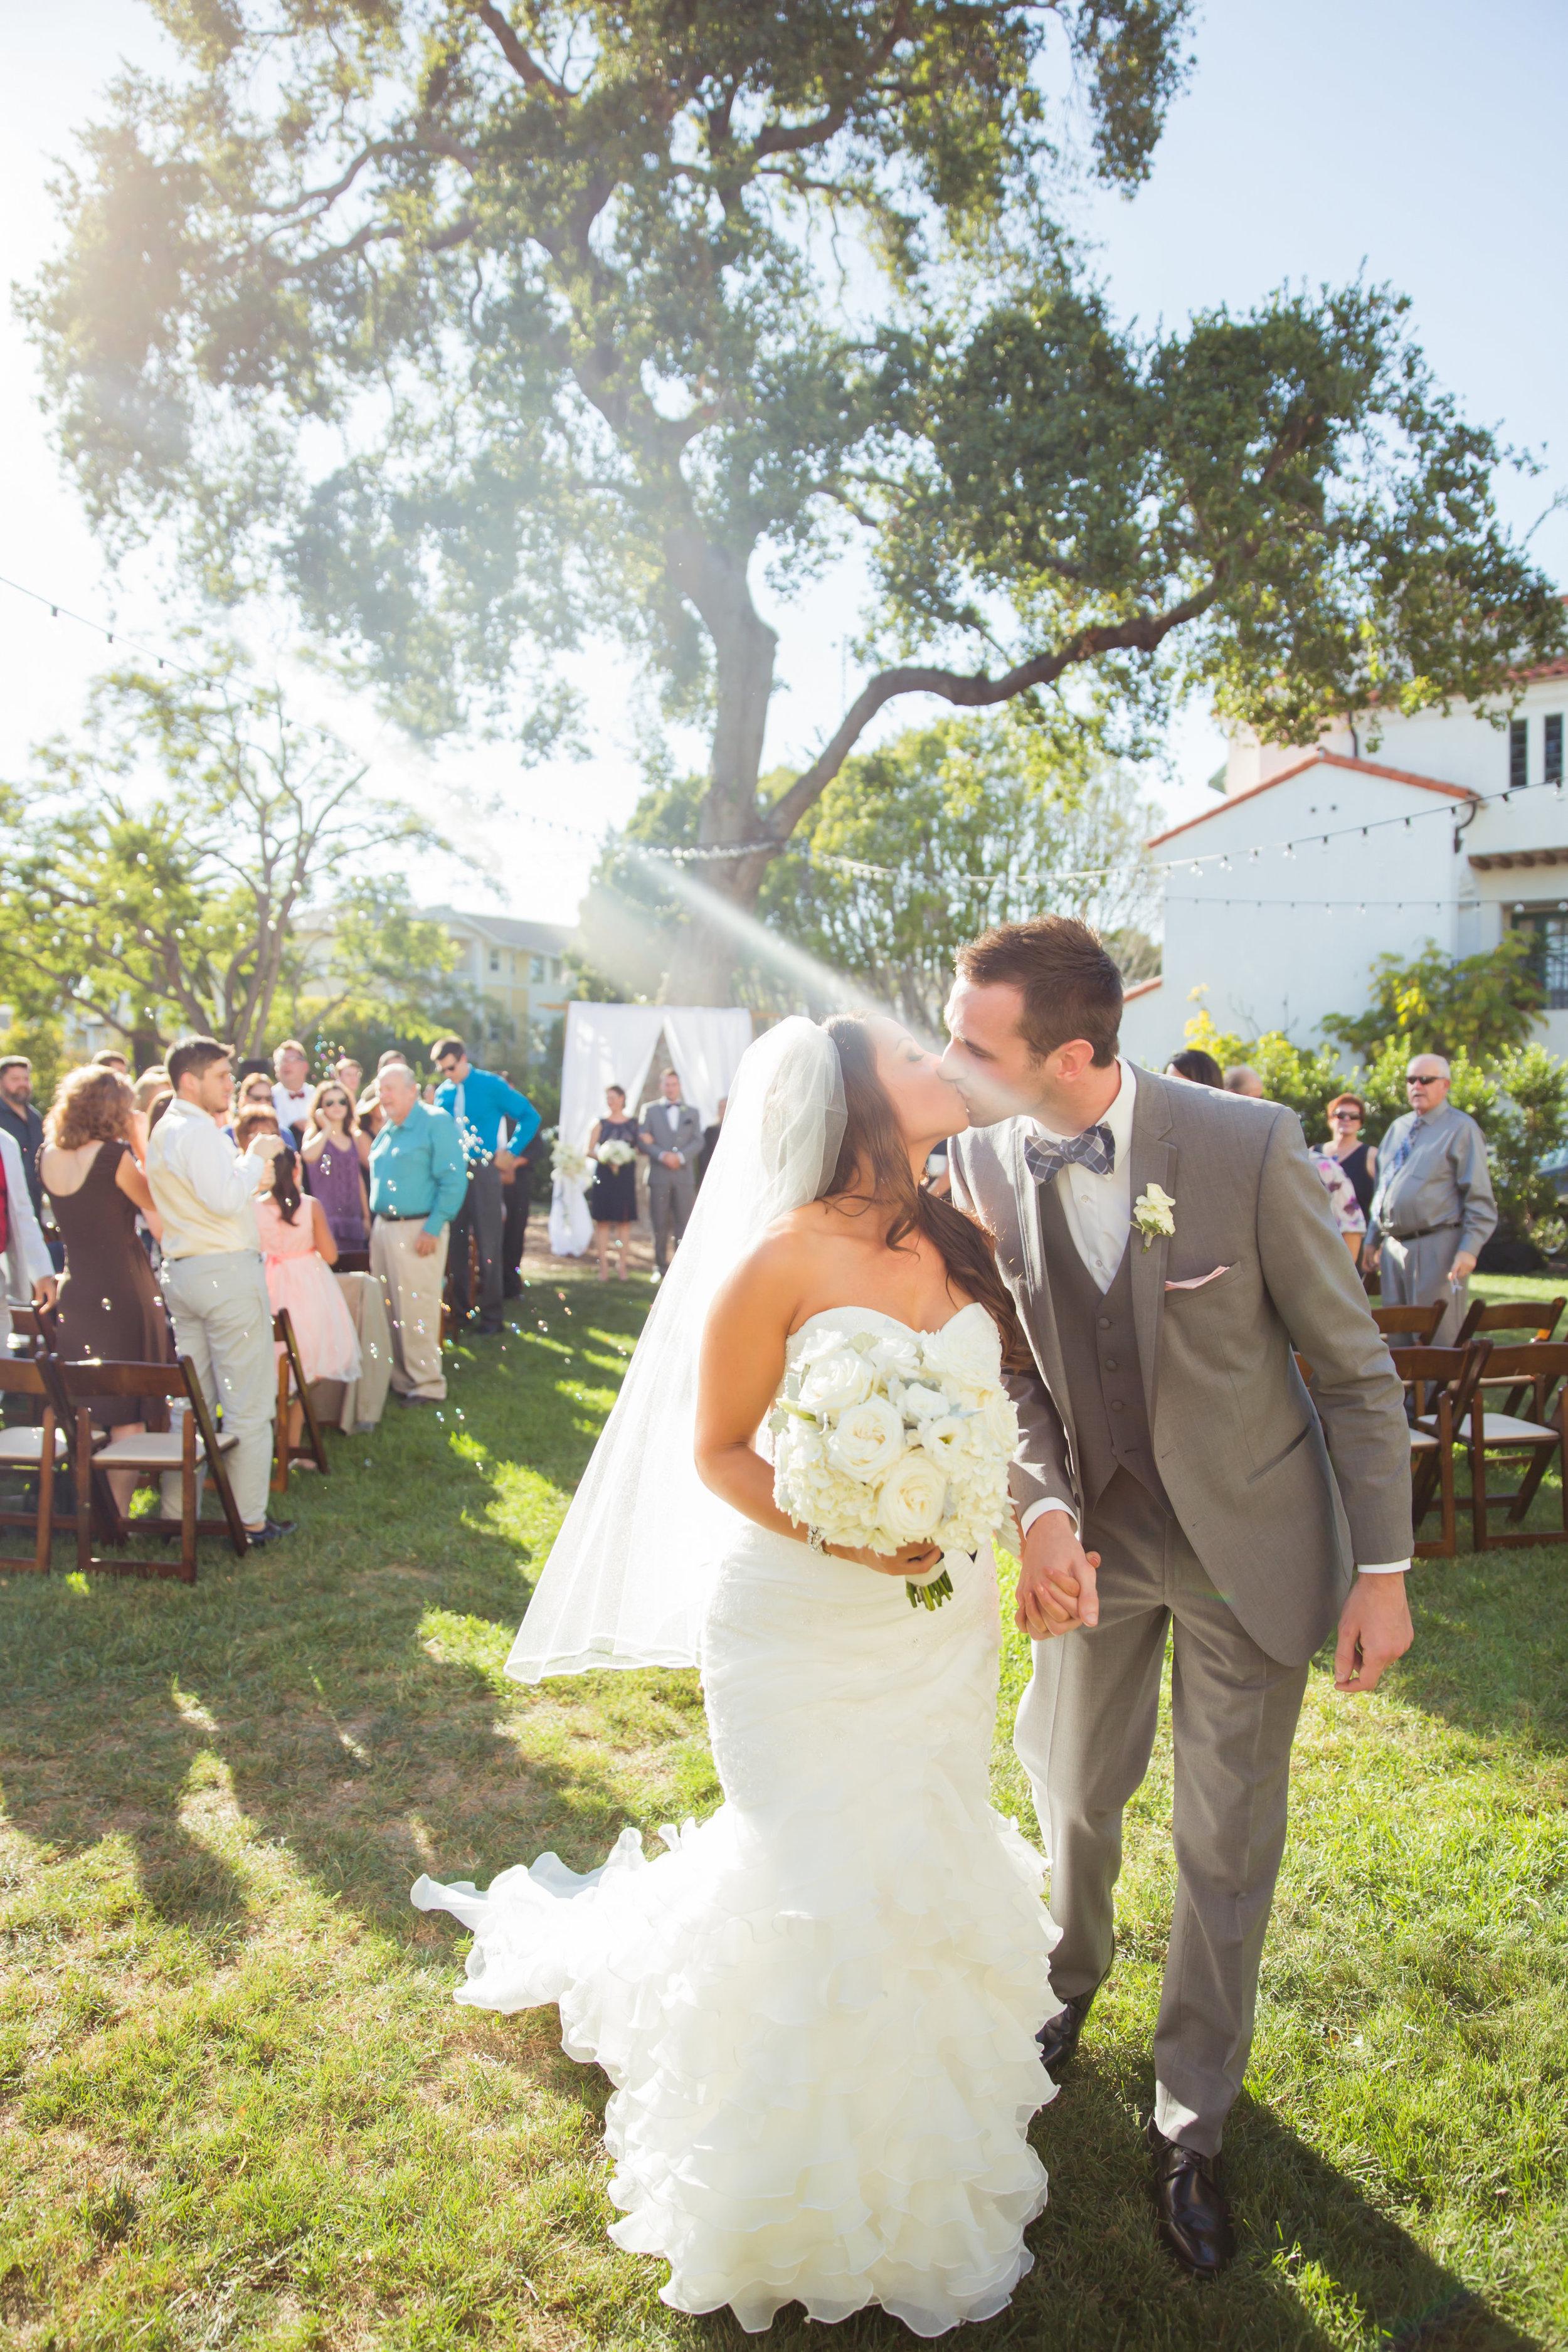 www.santabarbarawedding.com | Santa Barbara Club | Jessica Fairchild Photography | Bride and Groom | Ceremony